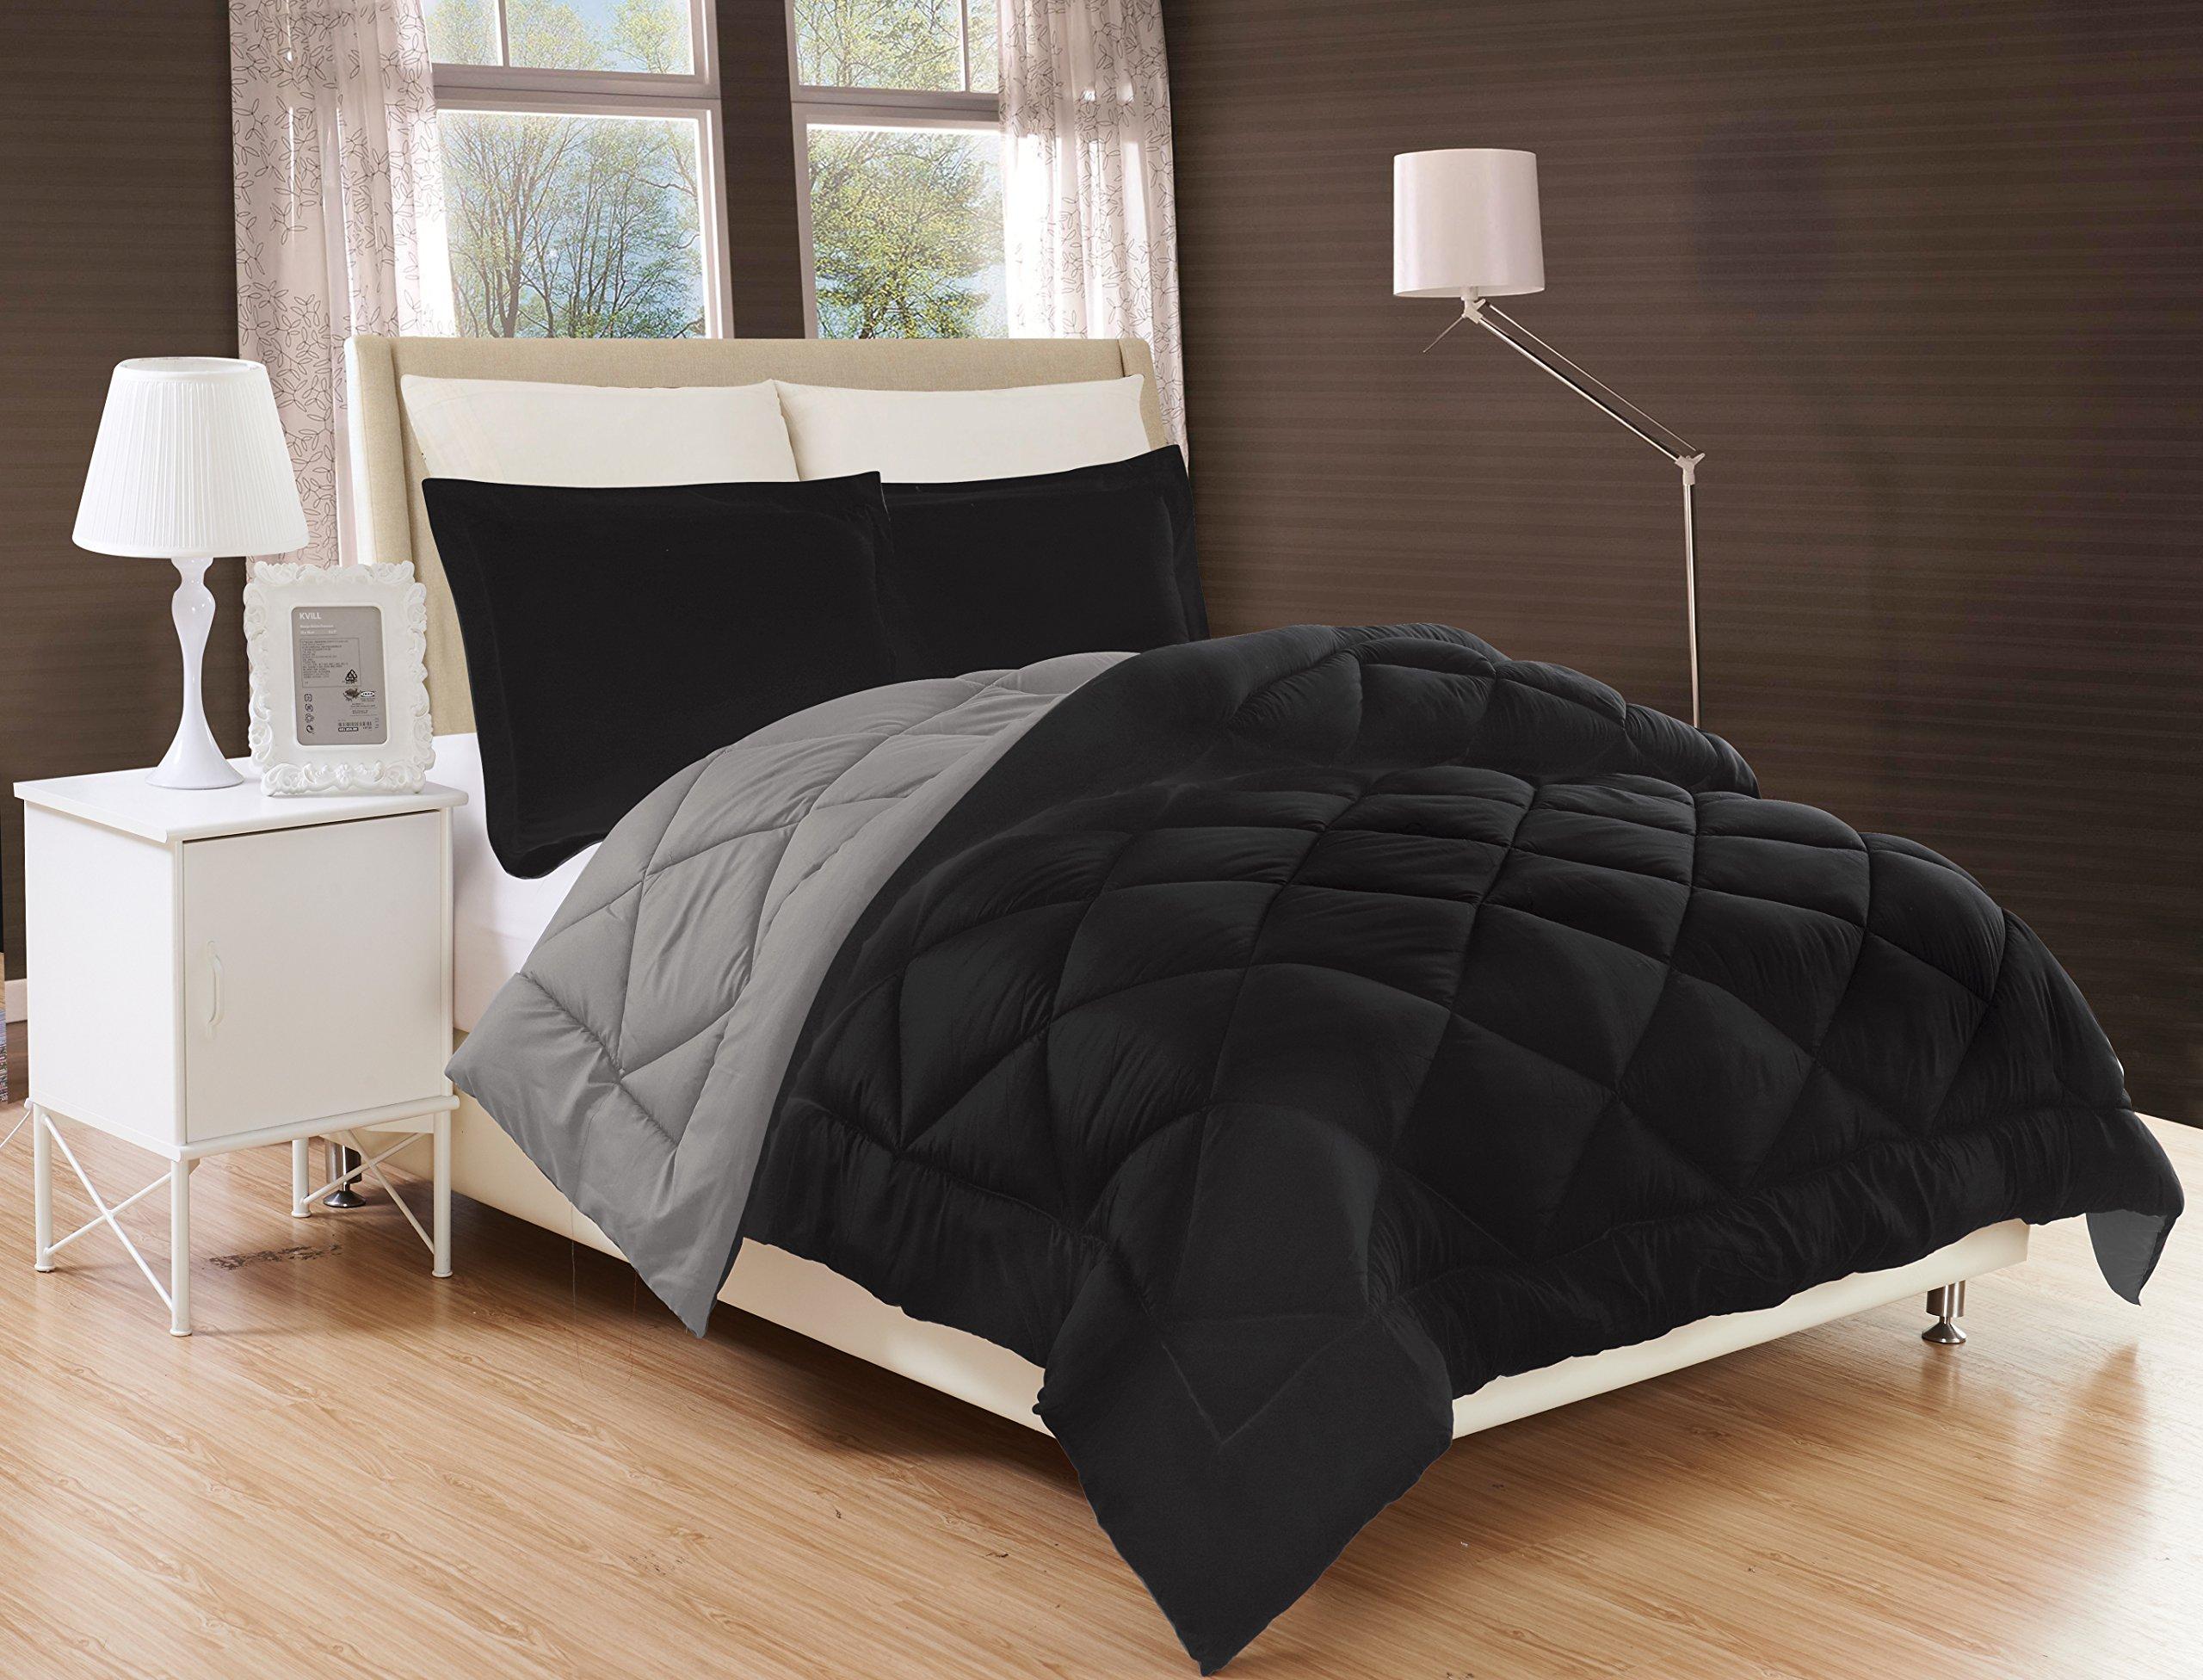 Hotel Luxury All Season Light Weight Down Alternative Reversible 3-Piece Comforter Set - HypoAllergenic, Diamond Stitched, … (Black/Grey, Queen)